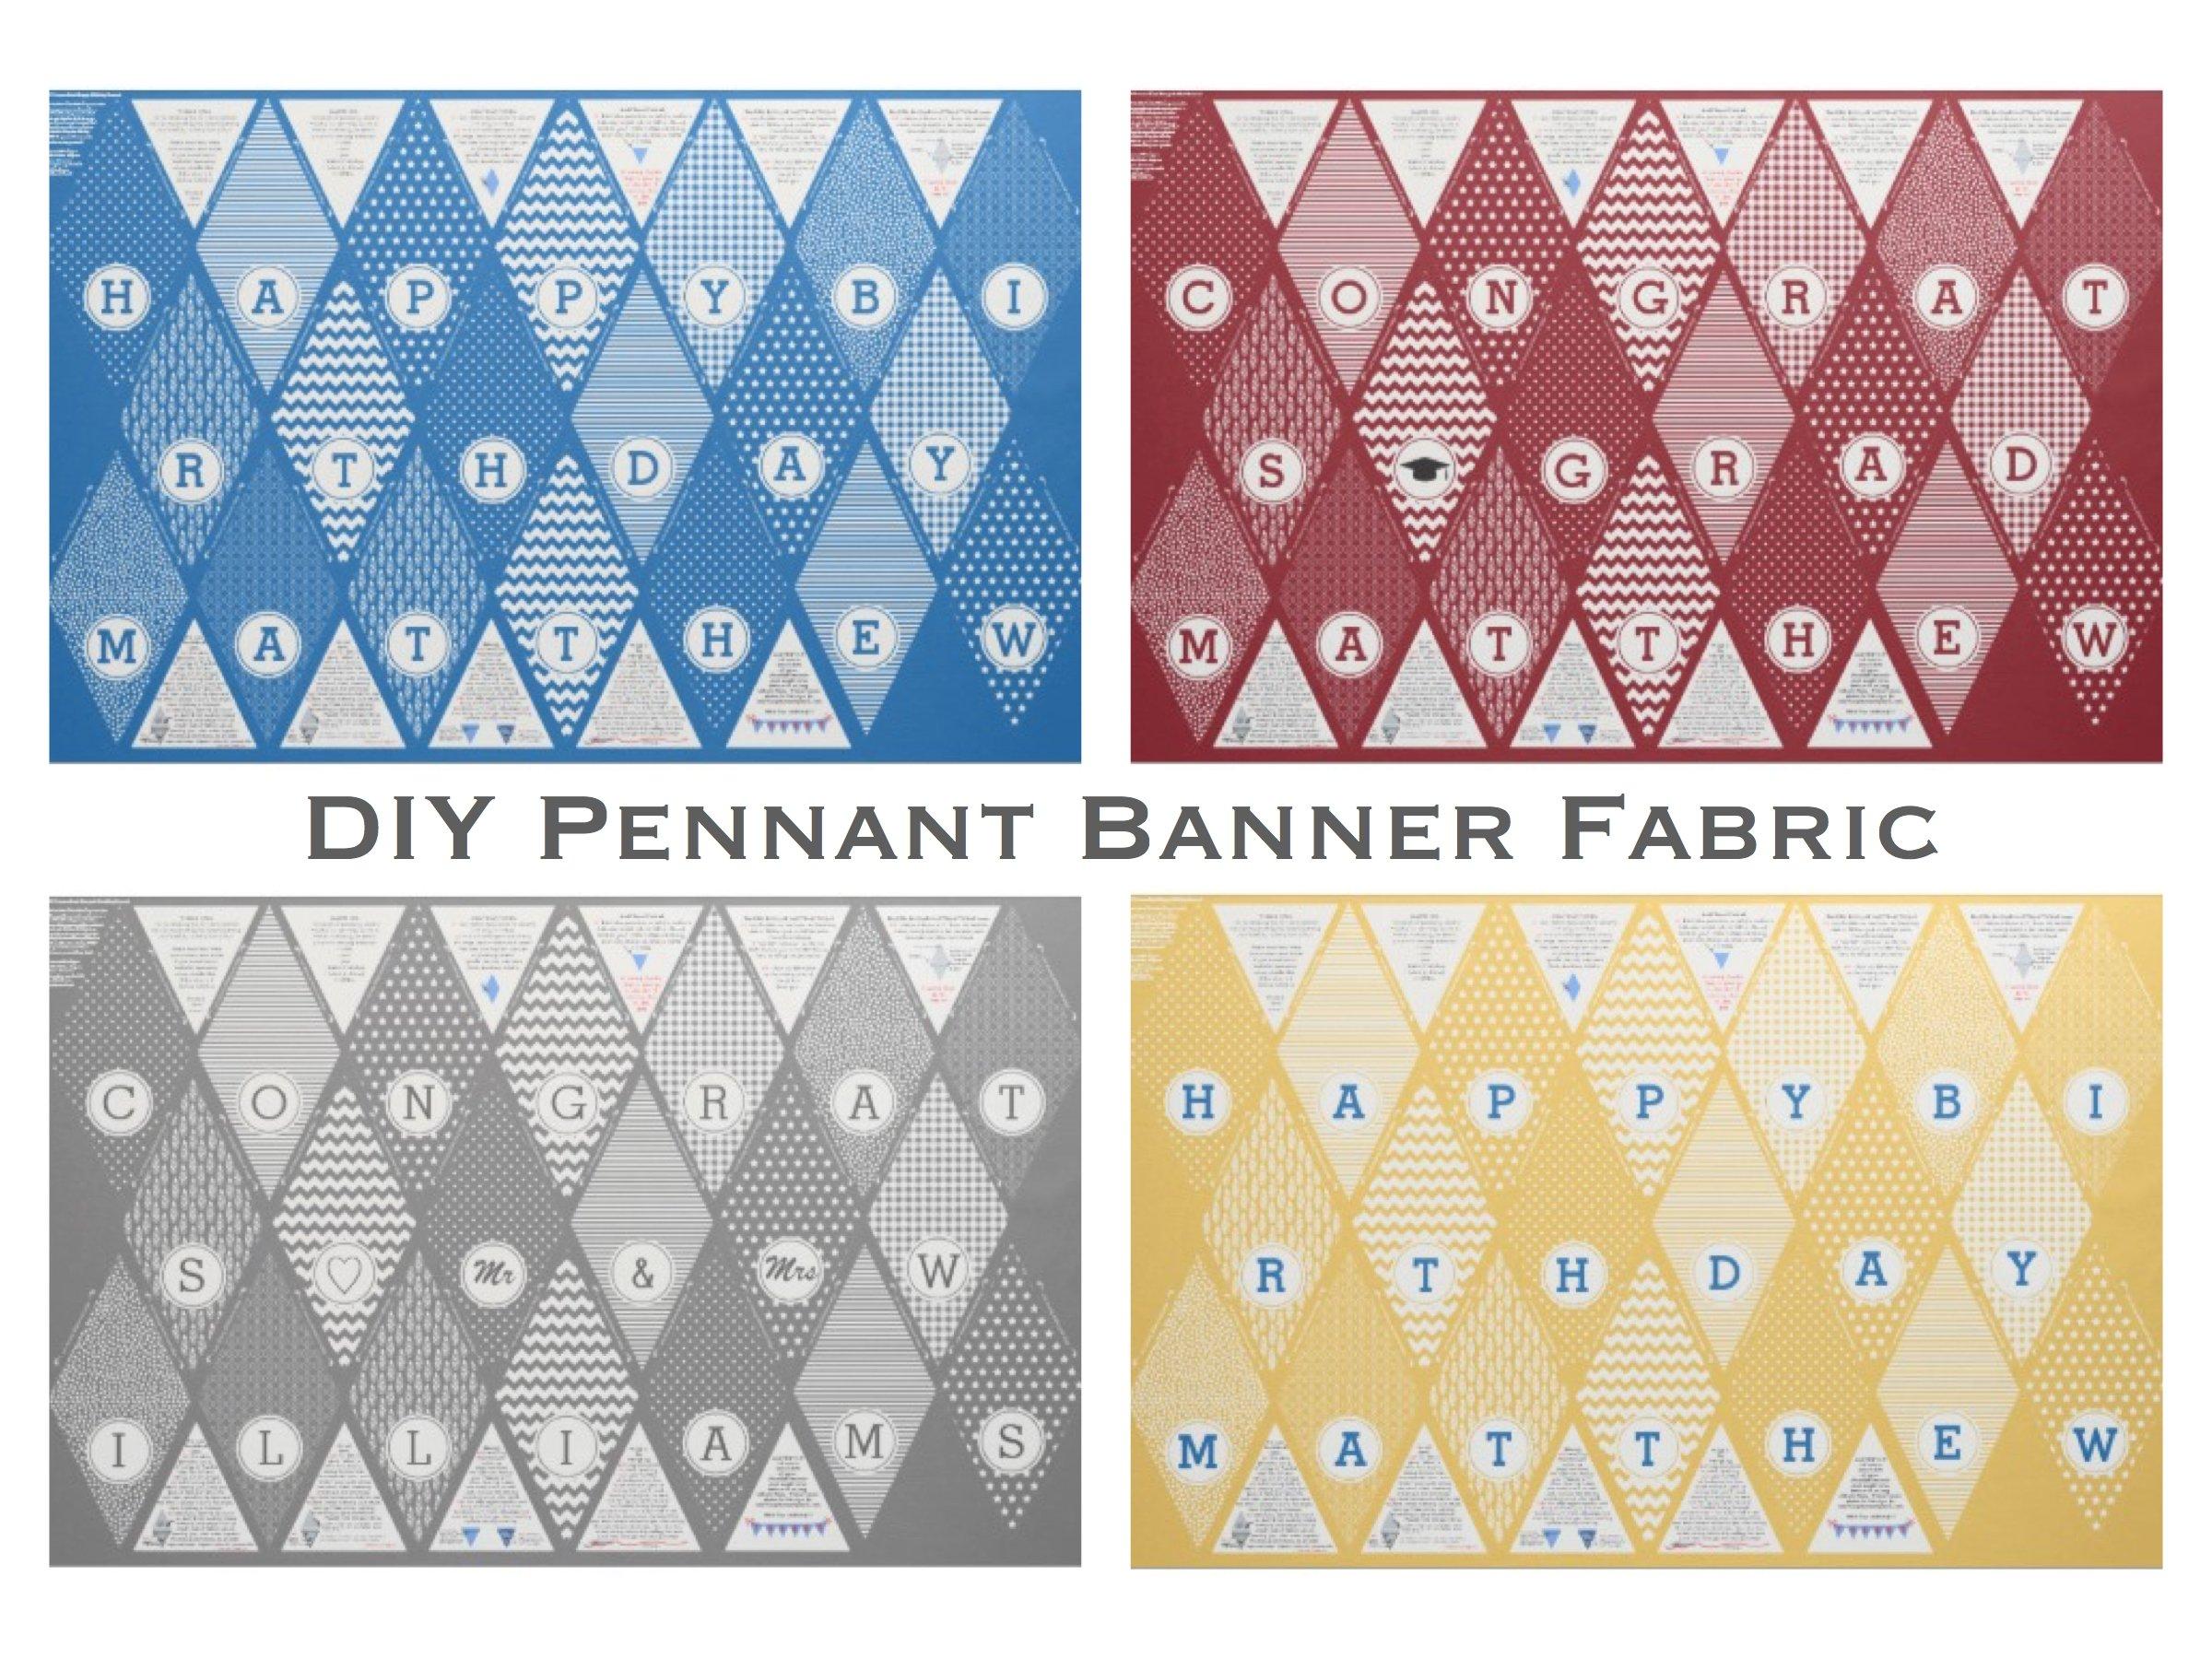 Custom DIY Pennant Banner Fabric